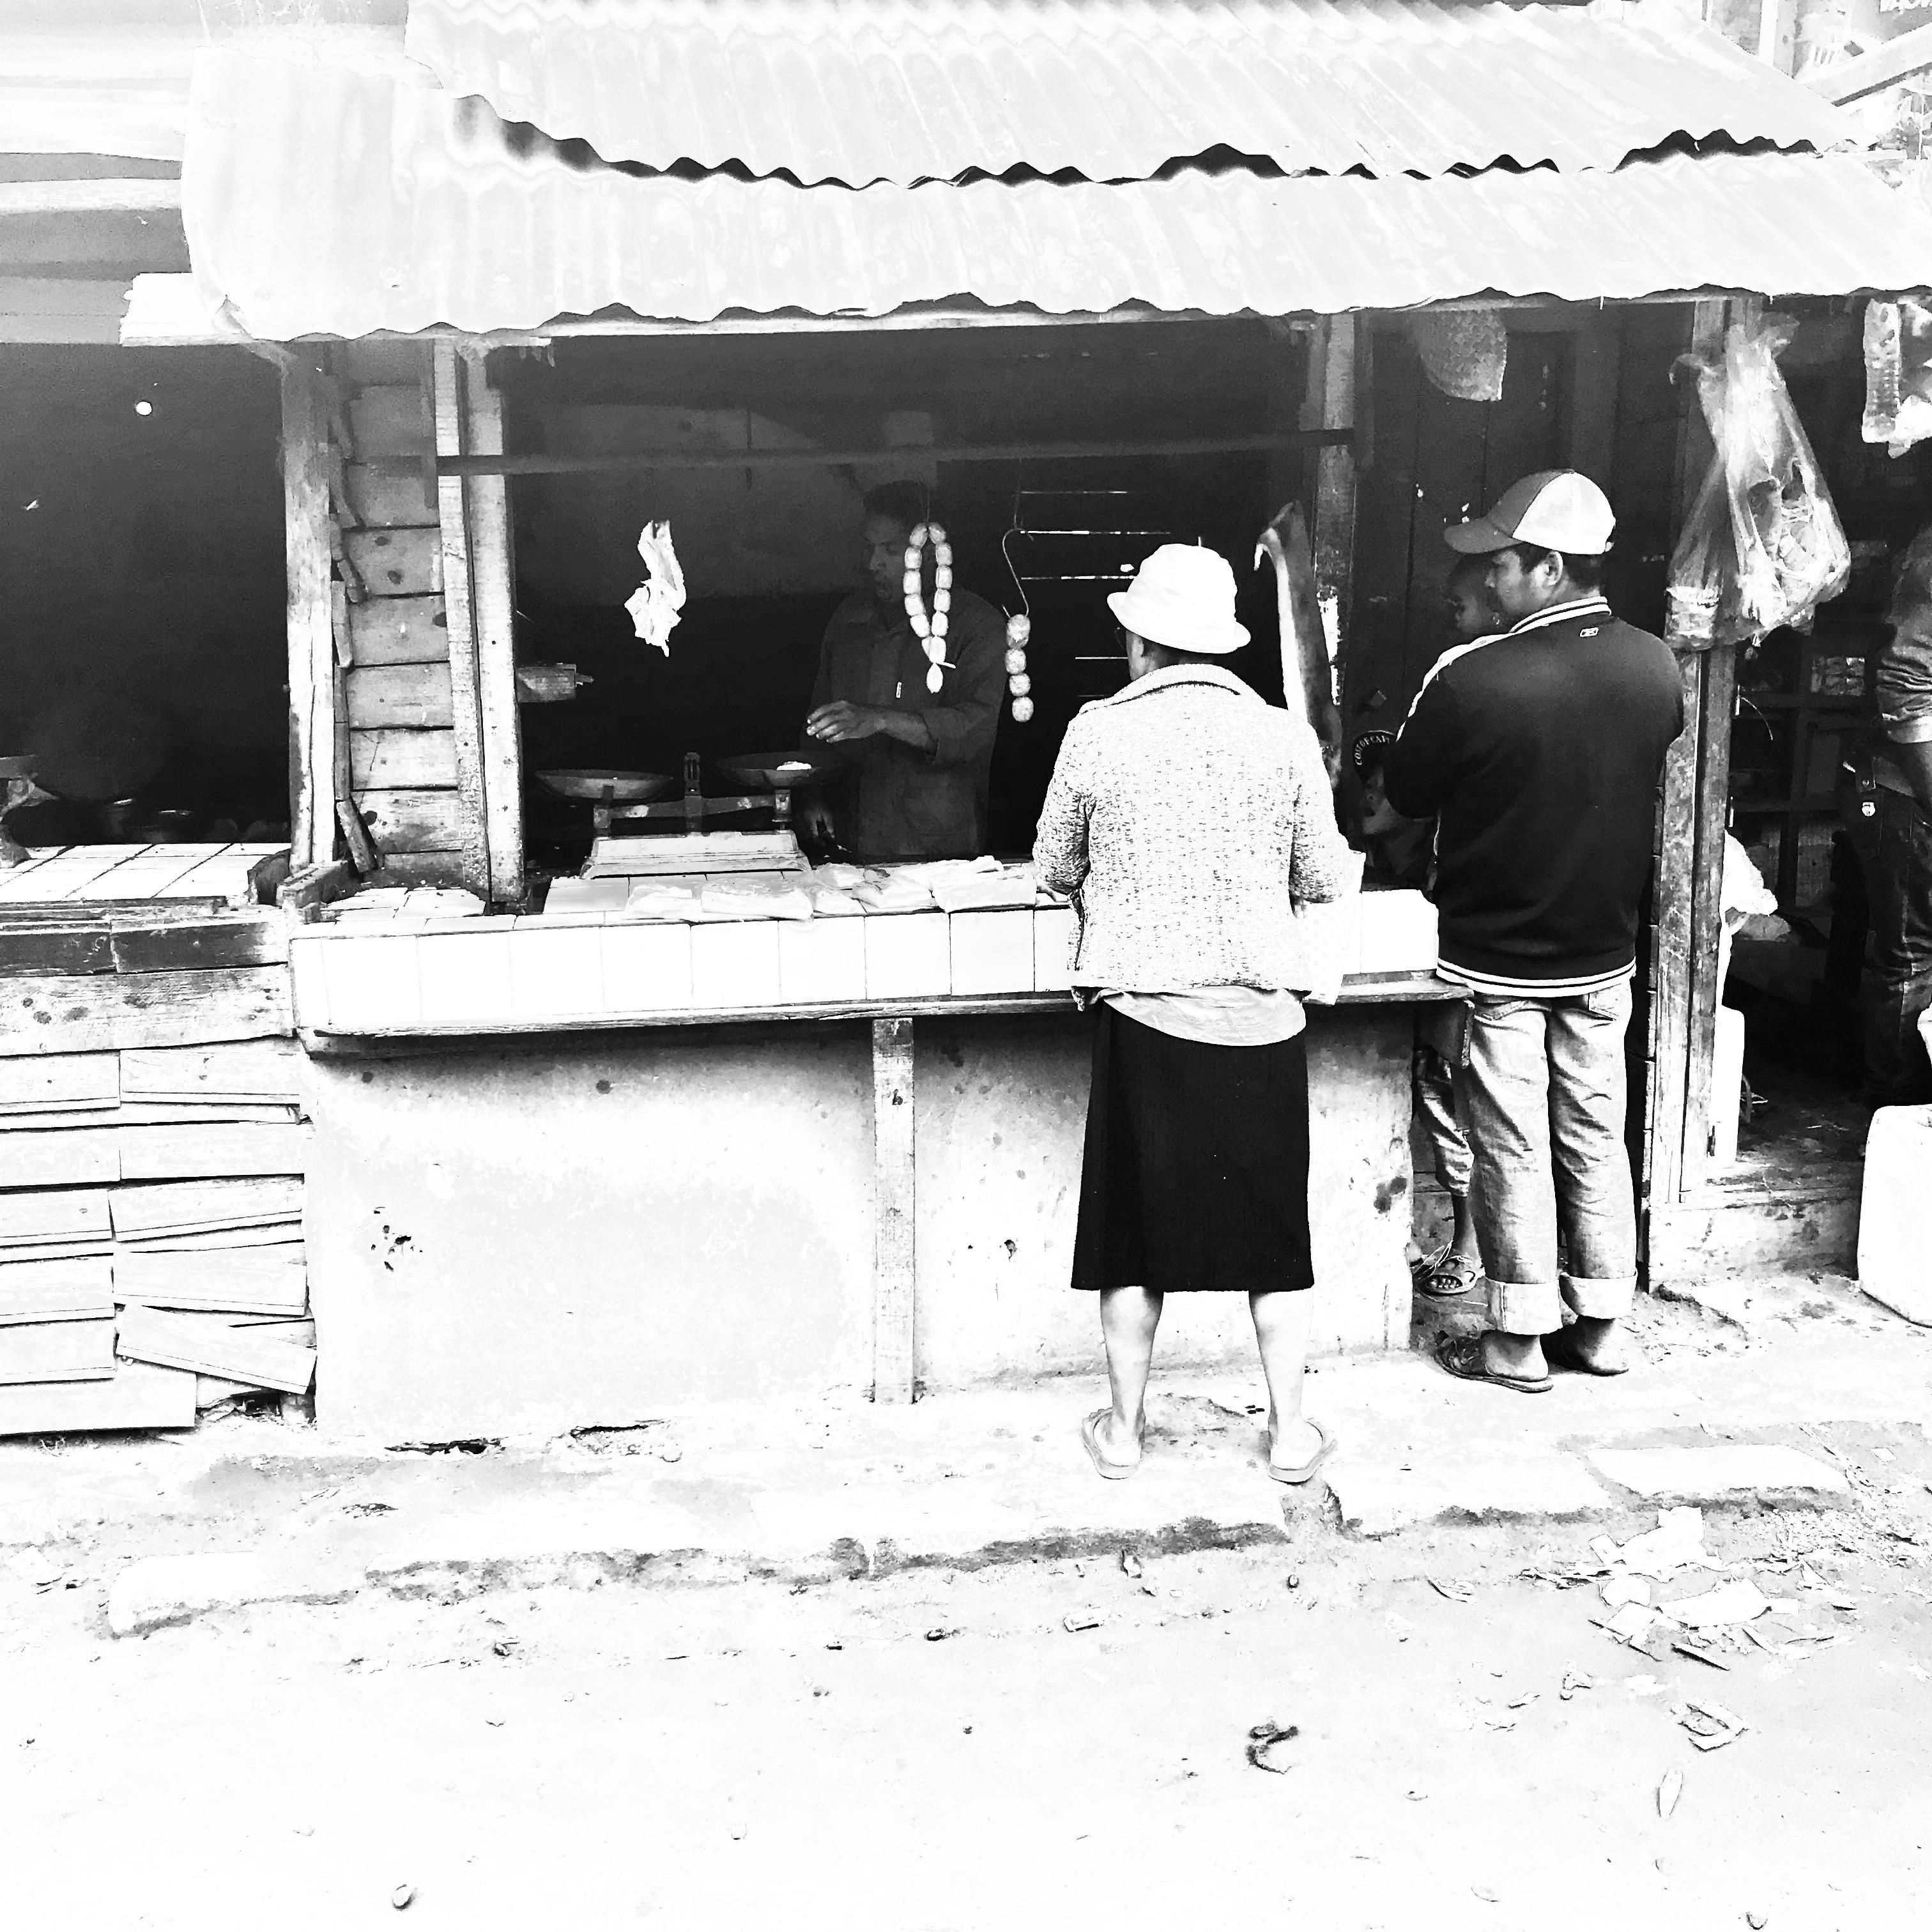 travail isidore lacour - MORAMANGA - le boucher - recto